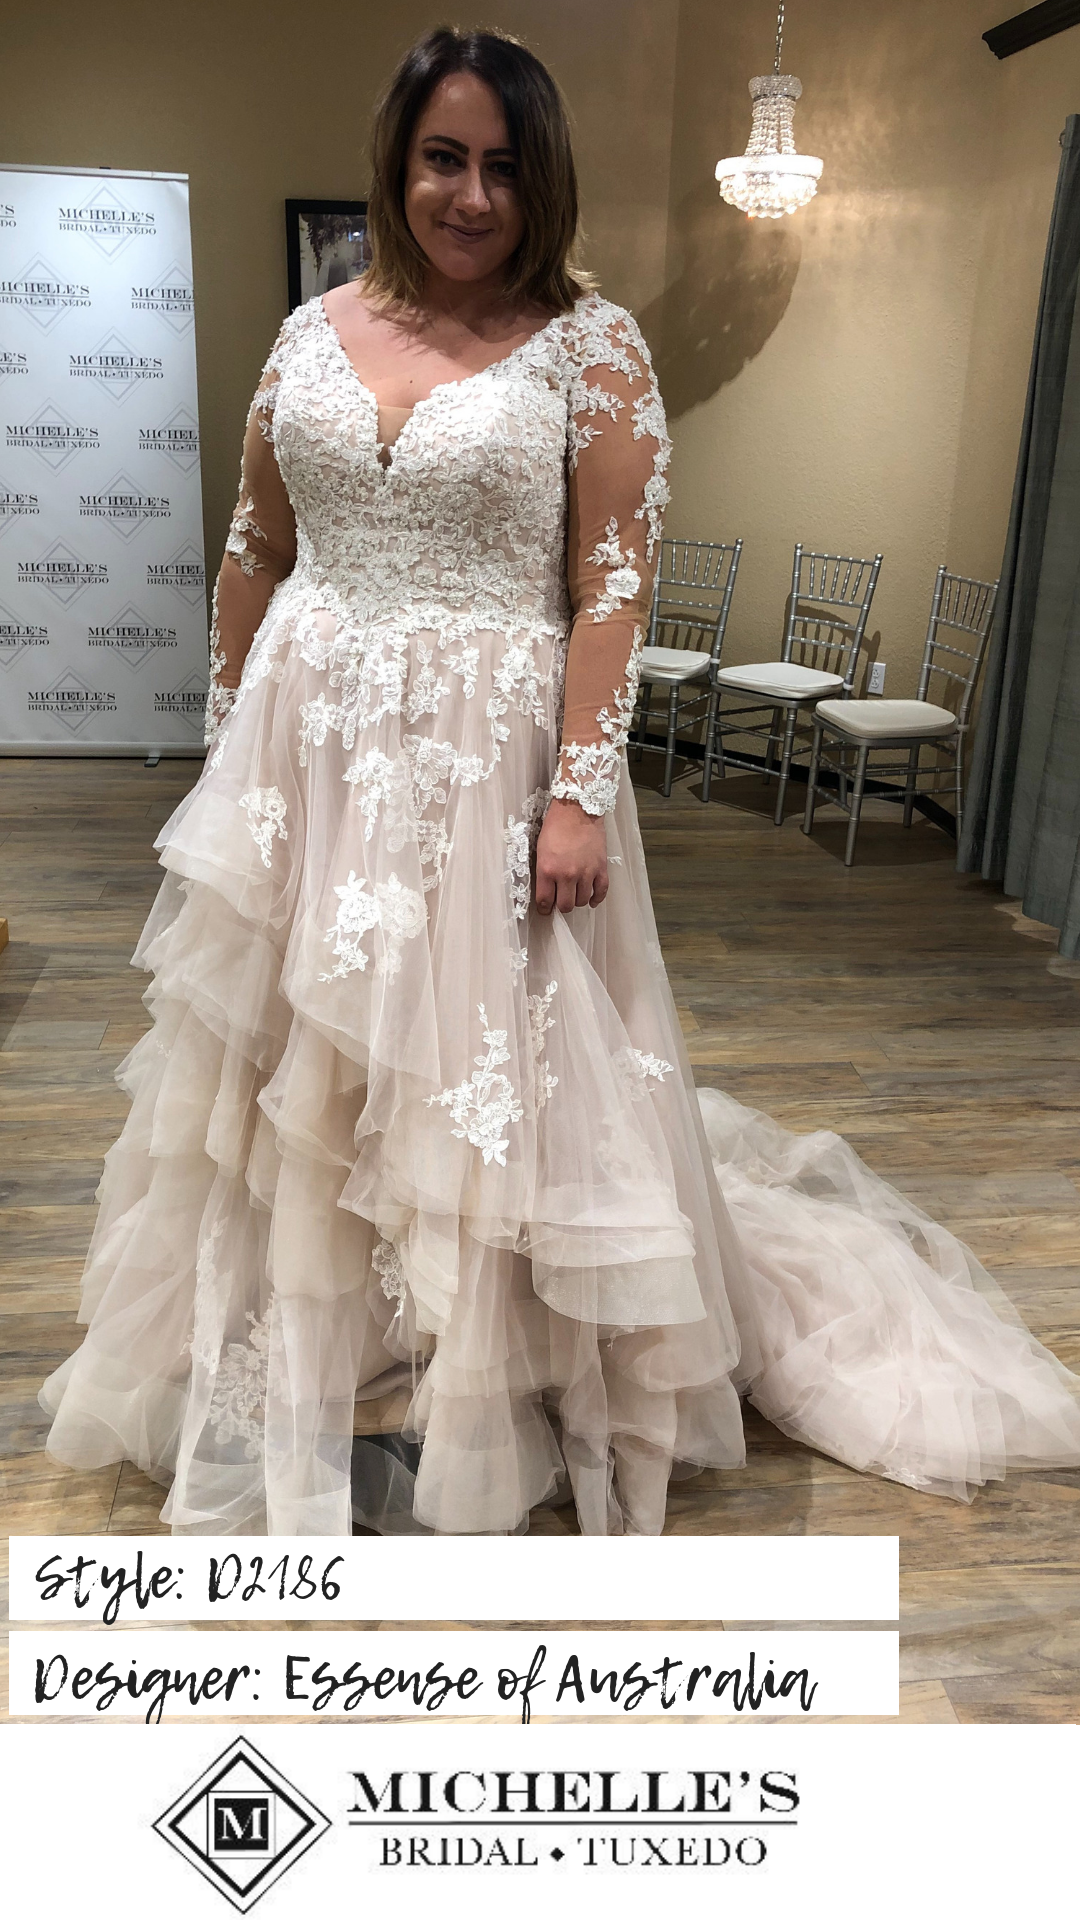 Plus Size Michelle S Bridal And Tuxedo Essense Of Australia Wedding Dresses Sleeved Wedding Dress Bridal [ 1920 x 1080 Pixel ]